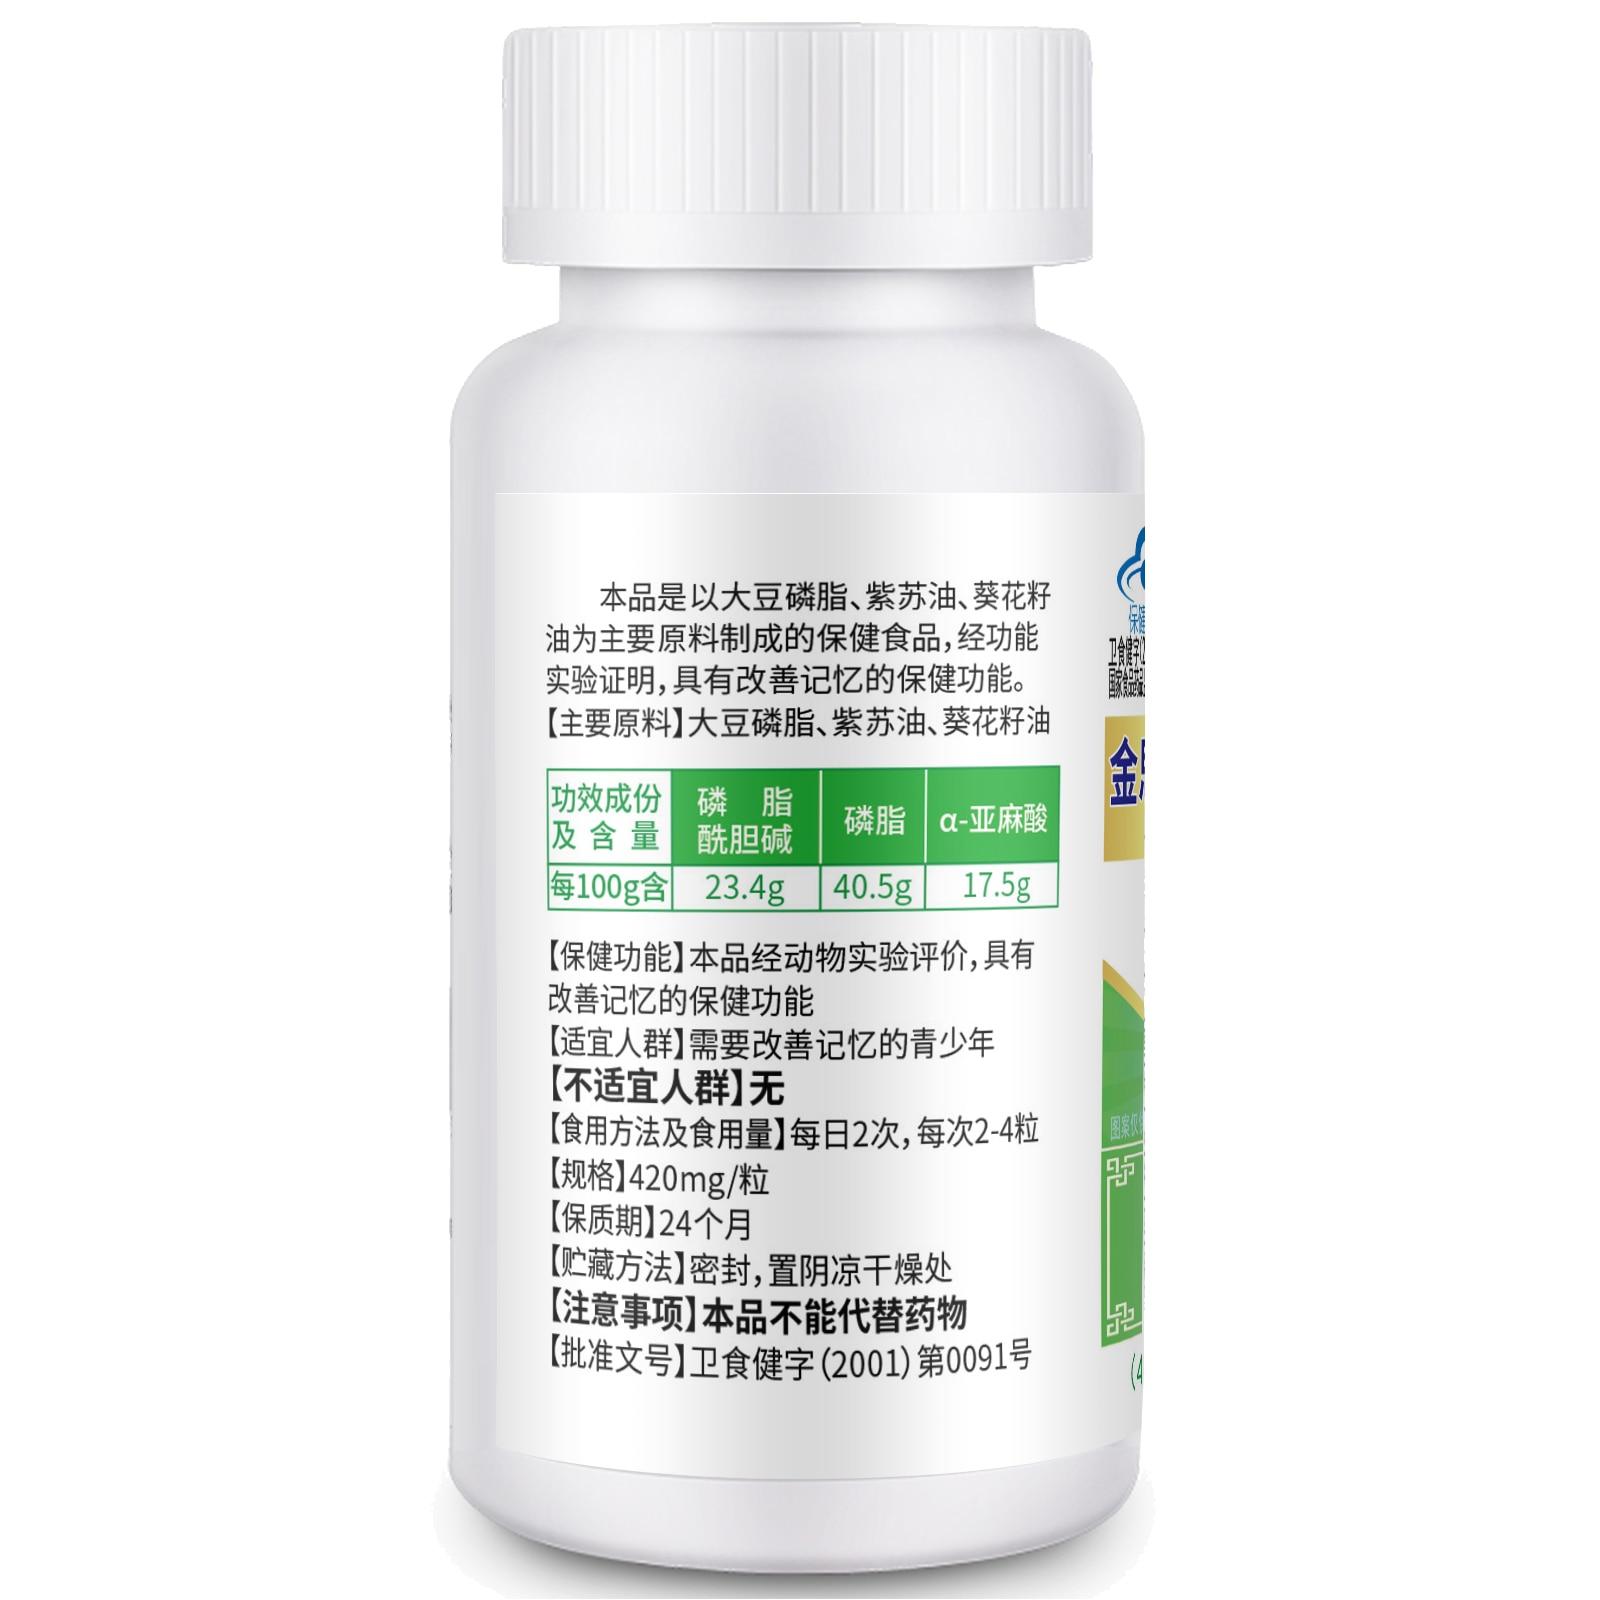 Soy Lecithin Perilla Oil Phosphatidylcholine Sunflower Oil Improve Memory Brain Health